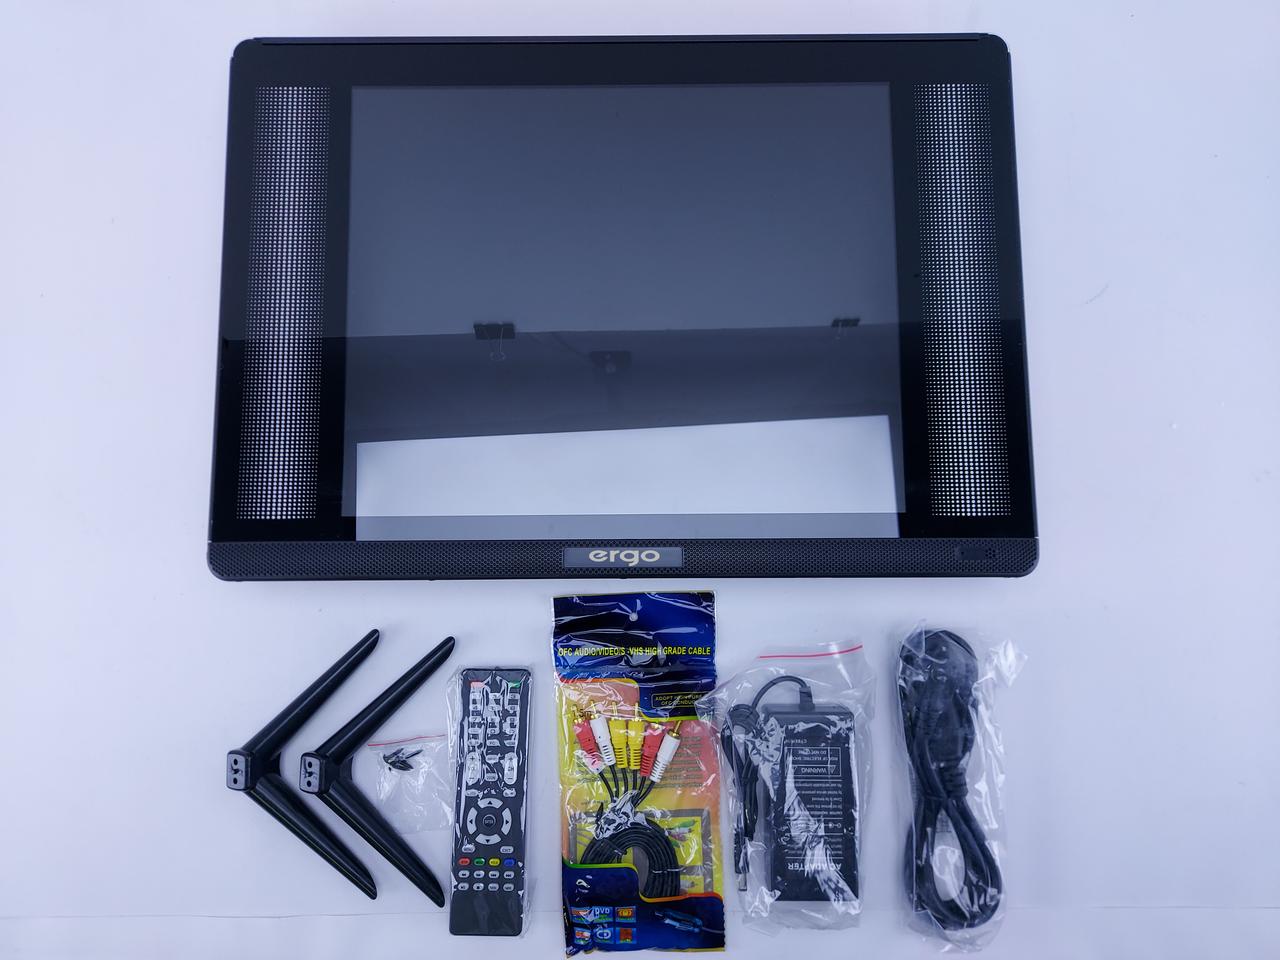 "Качественный Телевизор Ergo 19"" HD Ready/DVB-T2/USB (1366x768)"